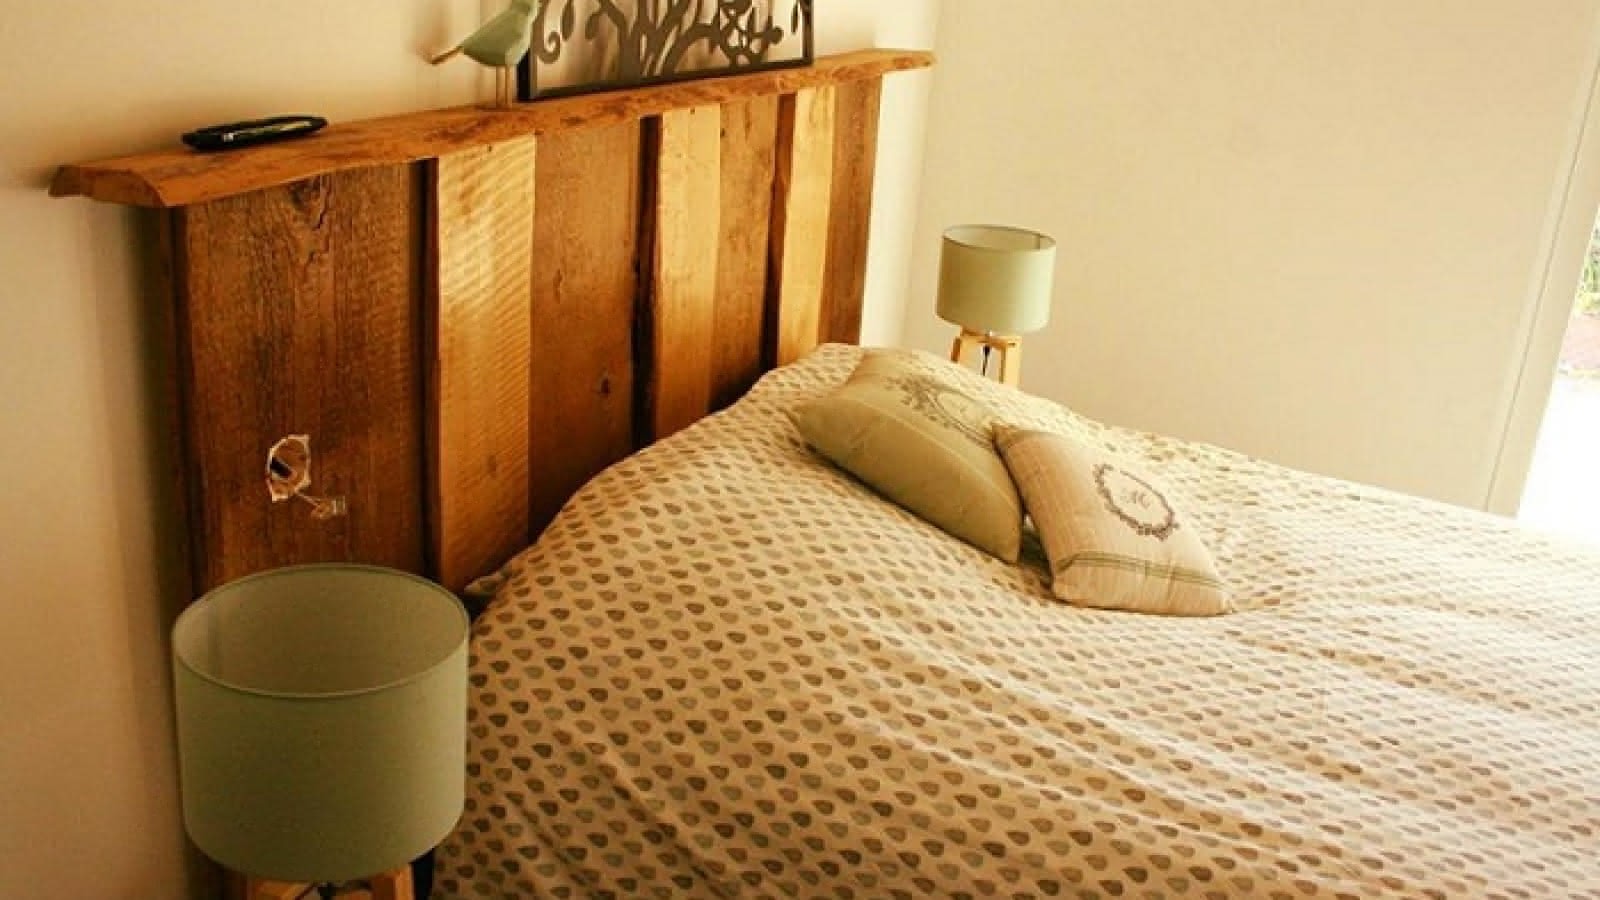 Chambres d\'hôtes Le Clos Bleu | Visit Alsace